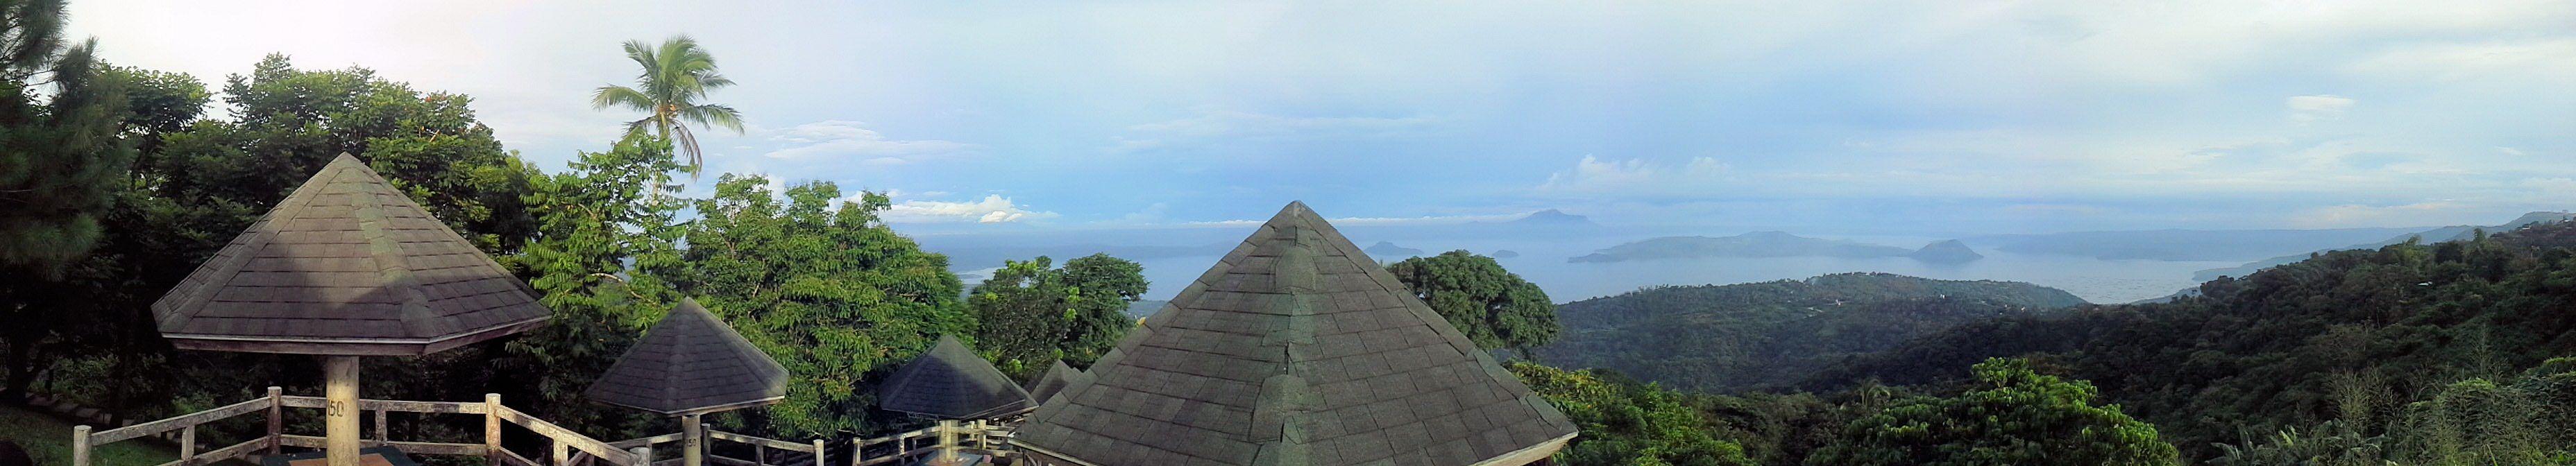 vulcano_tagaytay_philippines